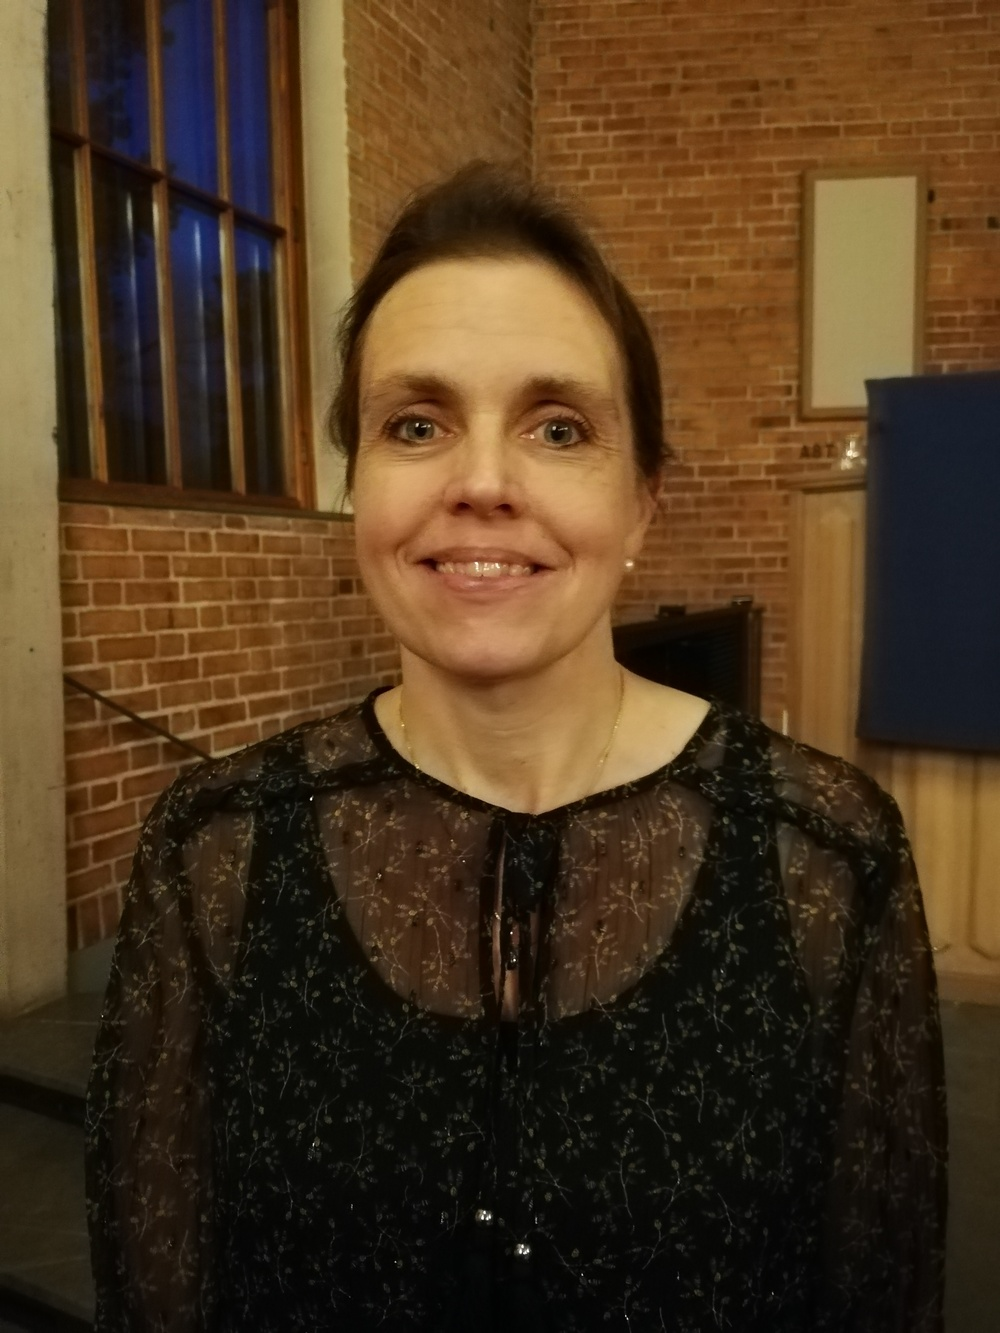 Lisa Arvidsson som tilldelas Deverthska Kulturstiftelsens stipendium 2019.